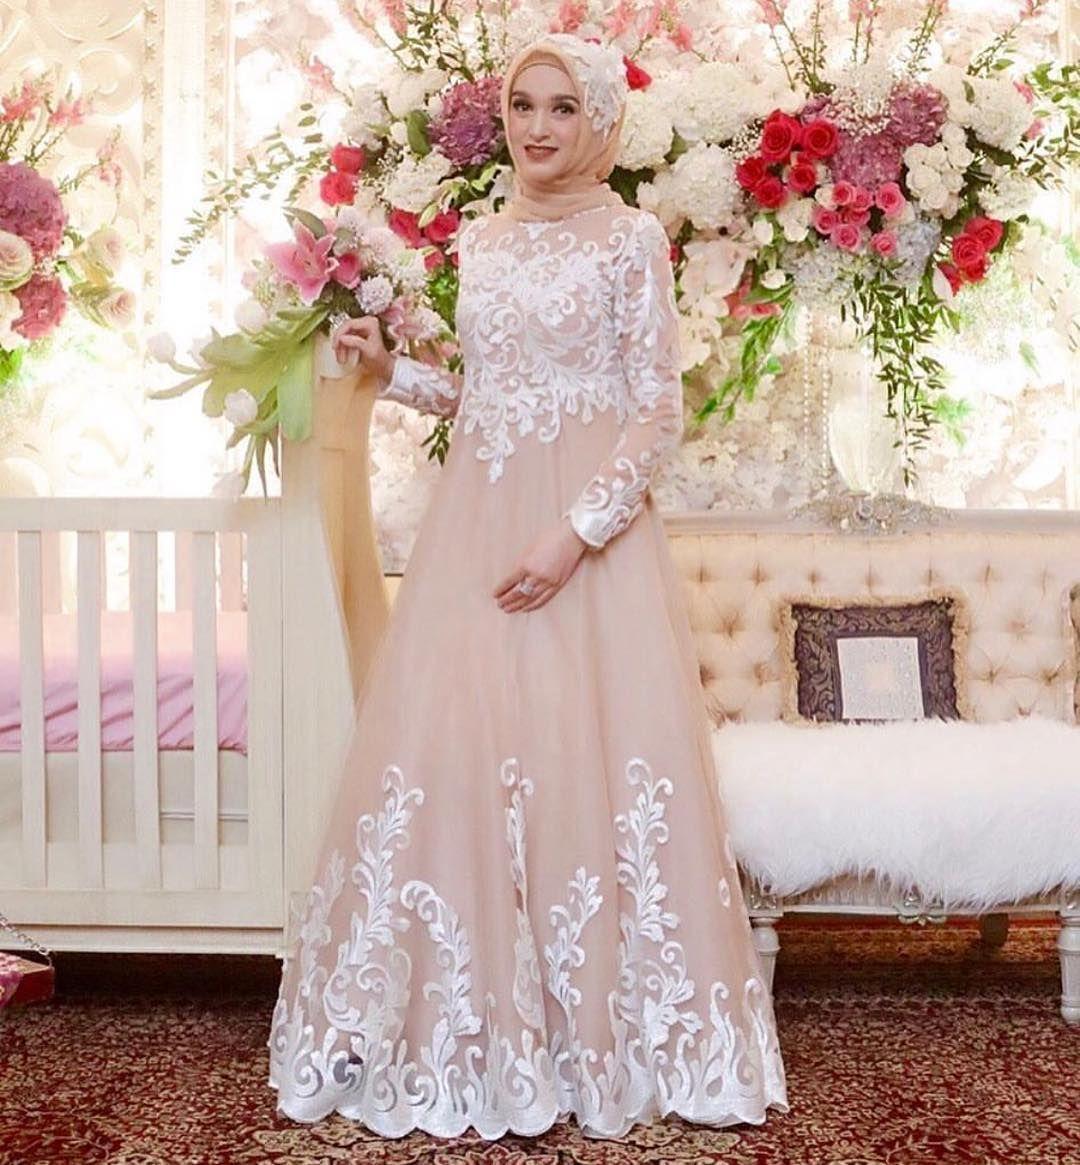 Baju Pesta Kebaya Ibu Hamil  Gaun pengantin sederhana, Pesta